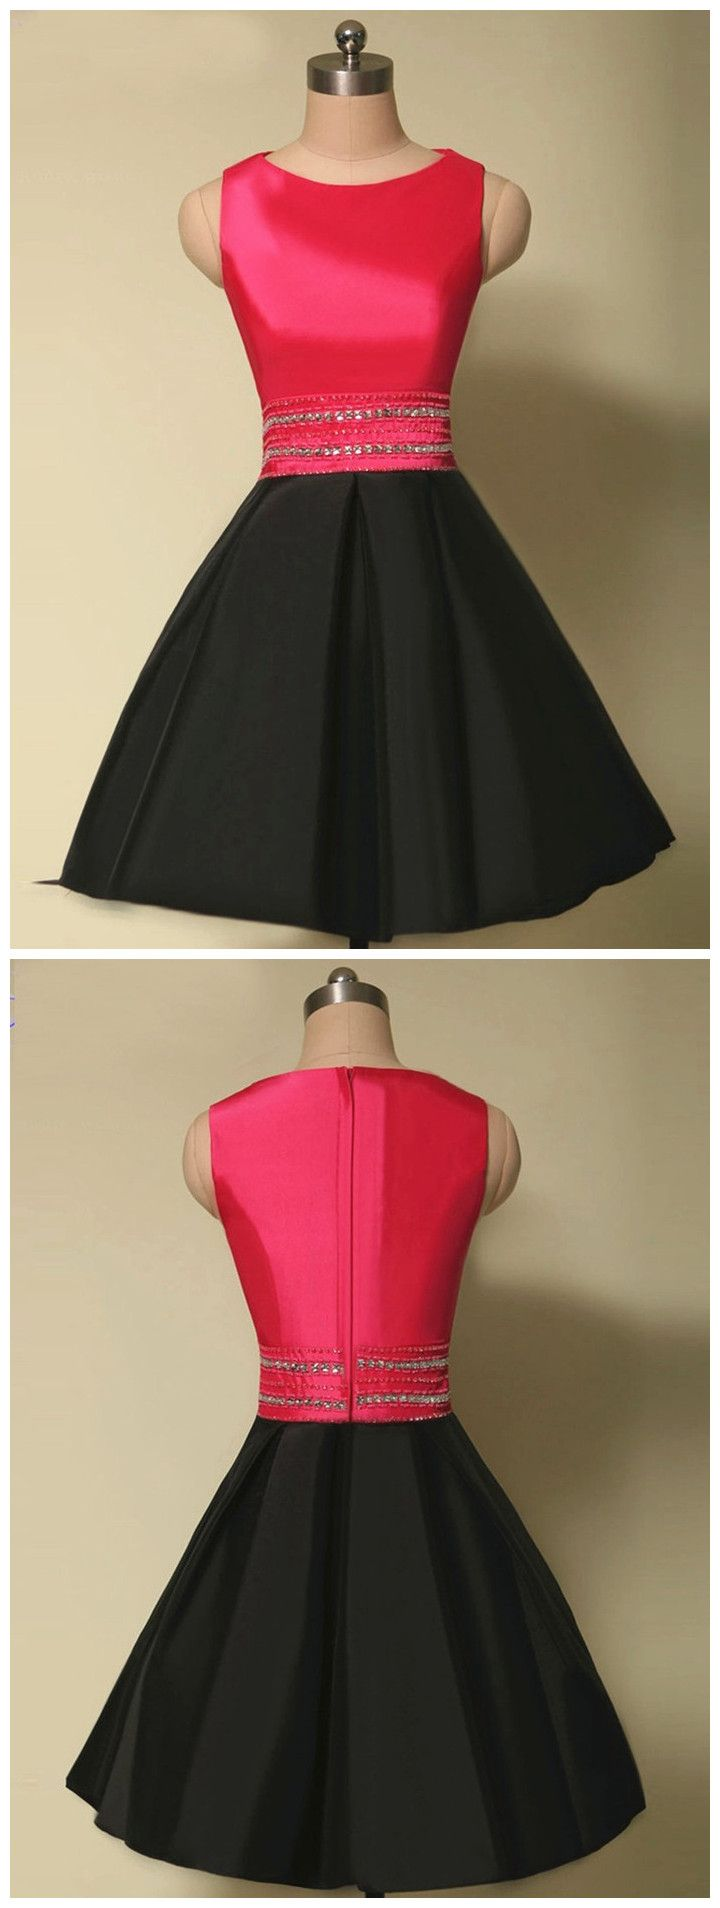 Cute aline homecoming dressesmini length black prom dressessatin